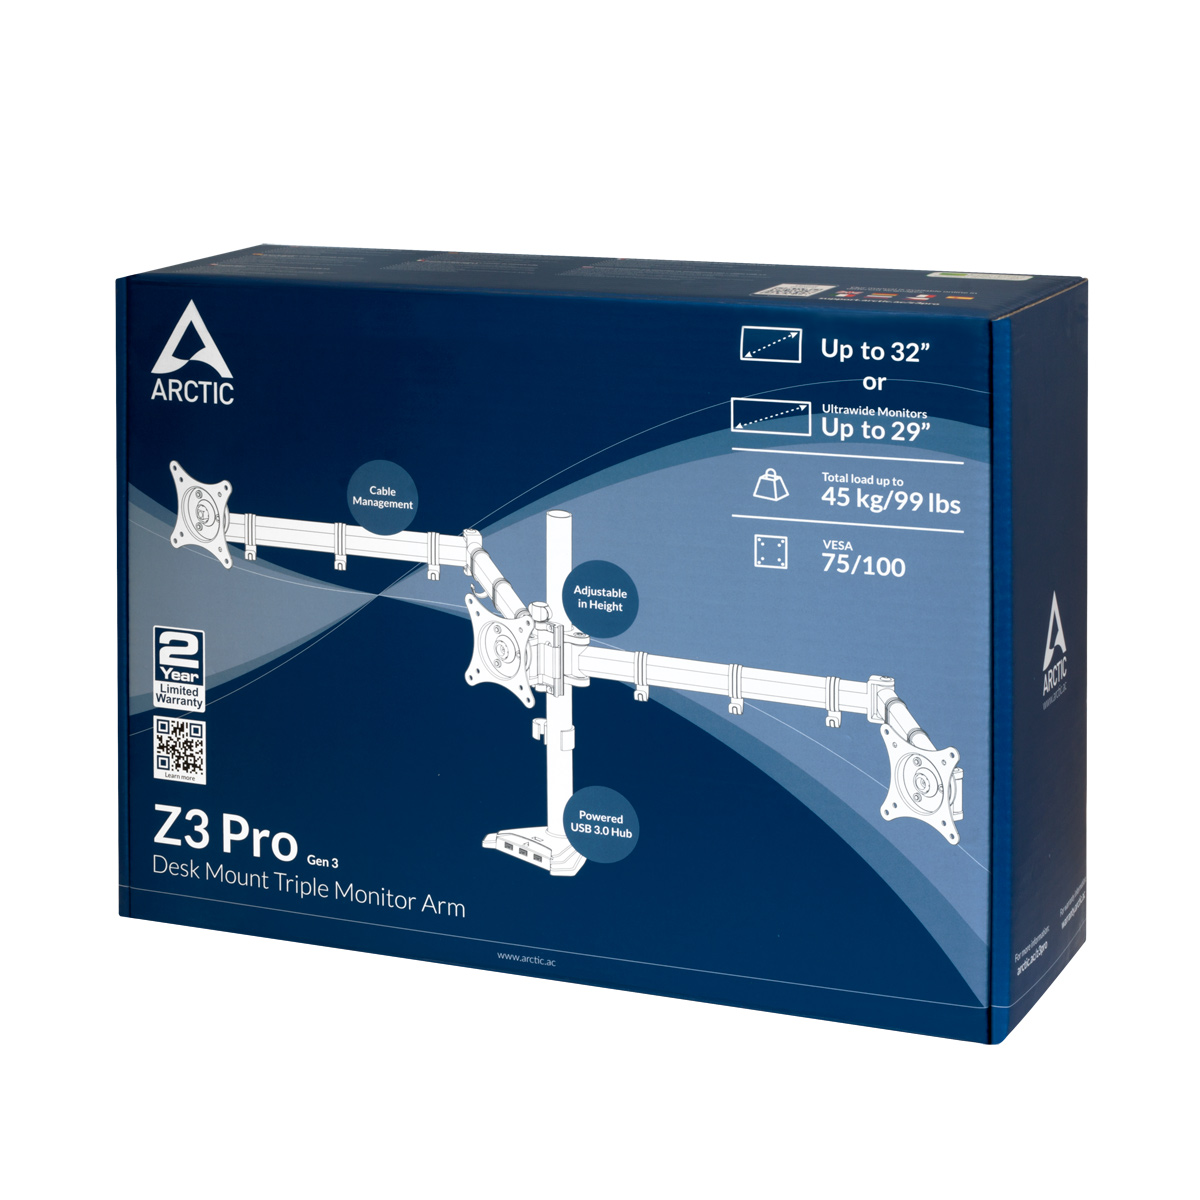 "Desk Mount Triple Monitor Z3 Pro Gen 3 Έως 32"" & Ultra Monitor Έως 29"" Έως 45kg image"